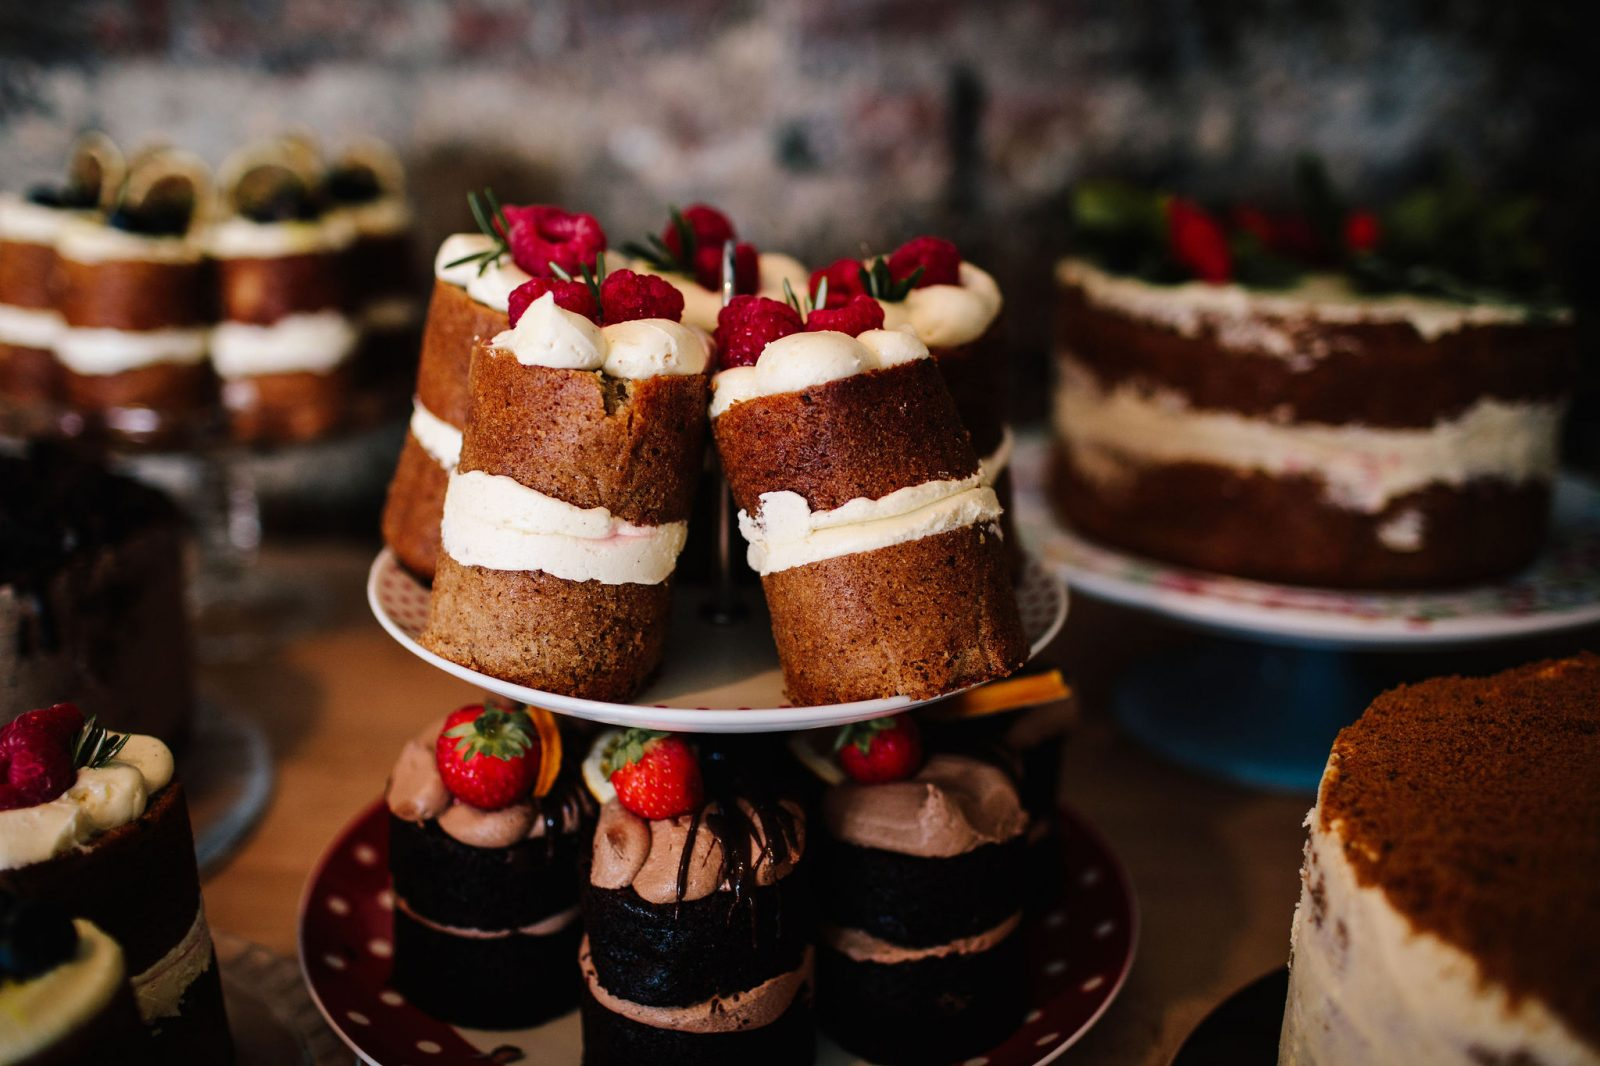 Vegan wedding cakes Brighton